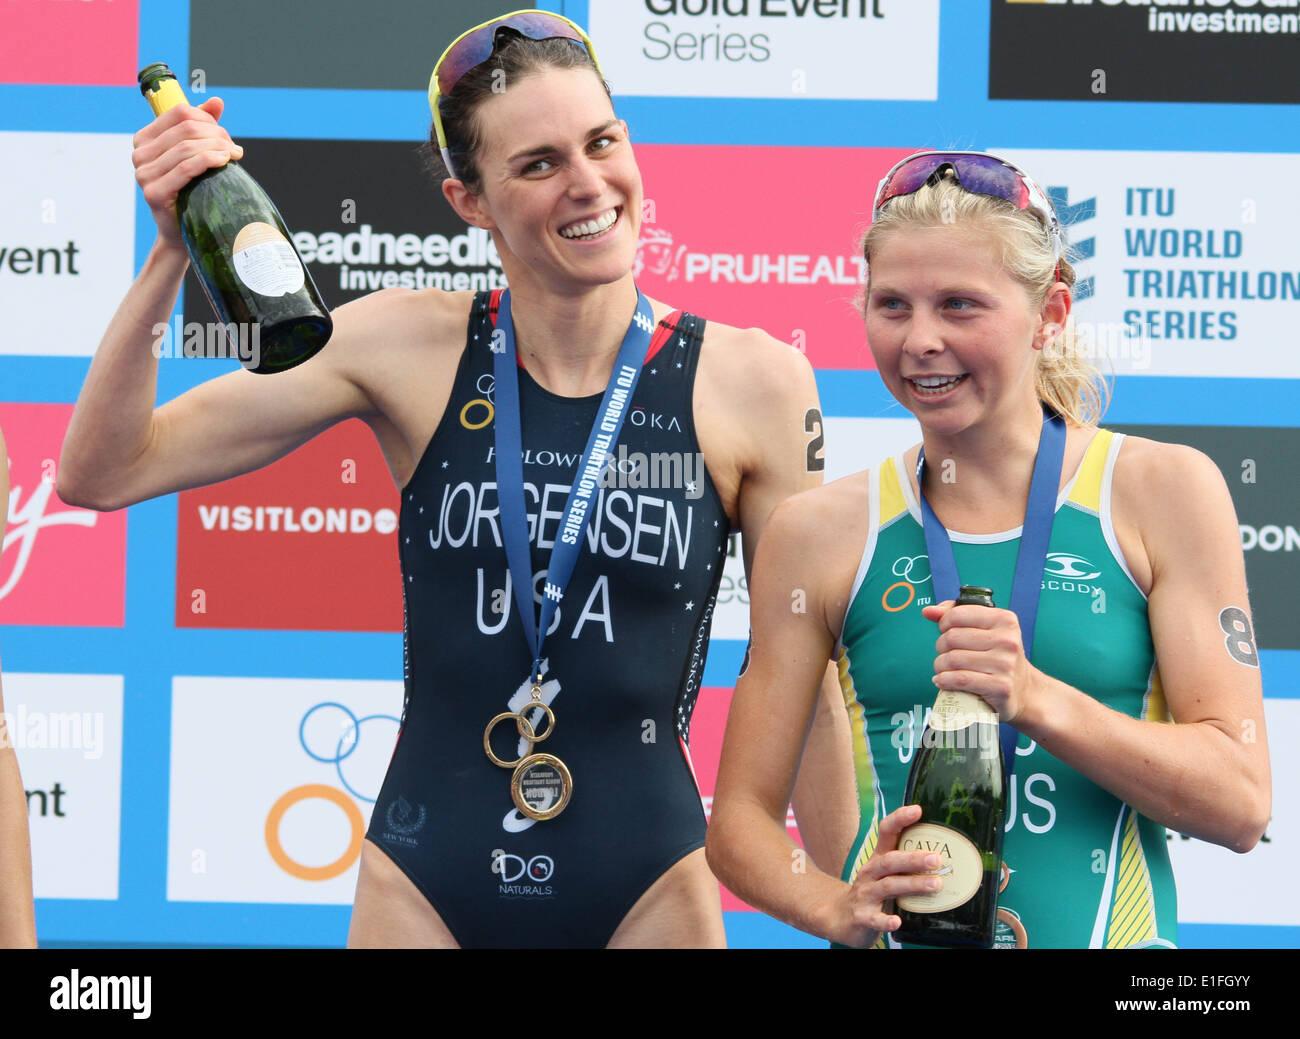 Gwen Jorgensen during the 2014 ITU Triathlon held in London - Stock Image